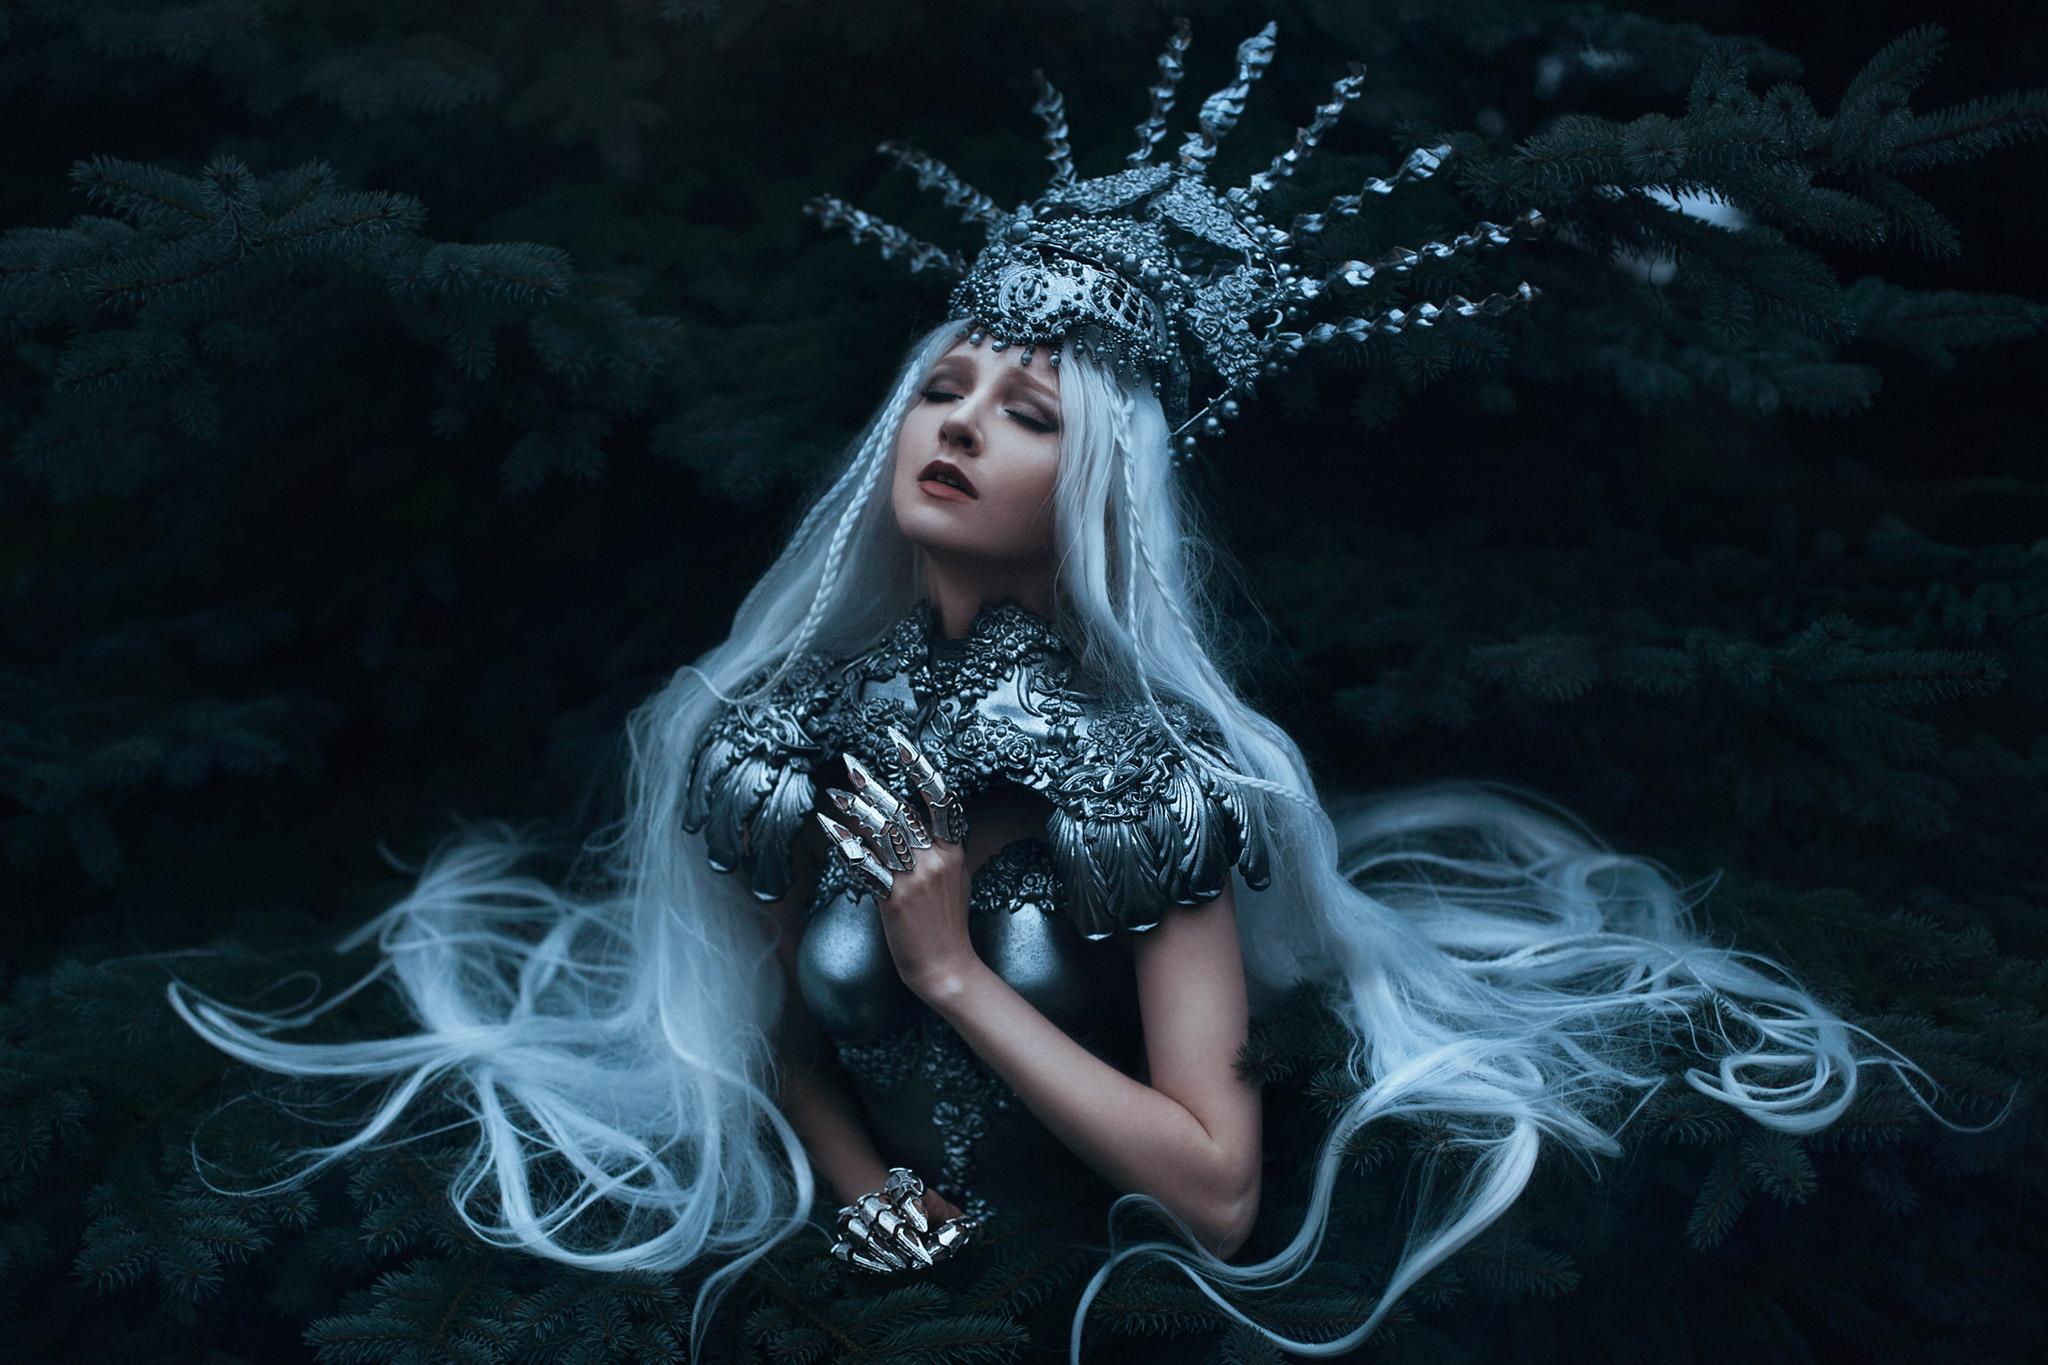 bella_kotak_maria_amanda_agnieszka_osipa_fairytale_fantasy_artist_photography_portrait_oxford_photographer_london_dark_magic_enchanted_worlds_fern-1.jpg